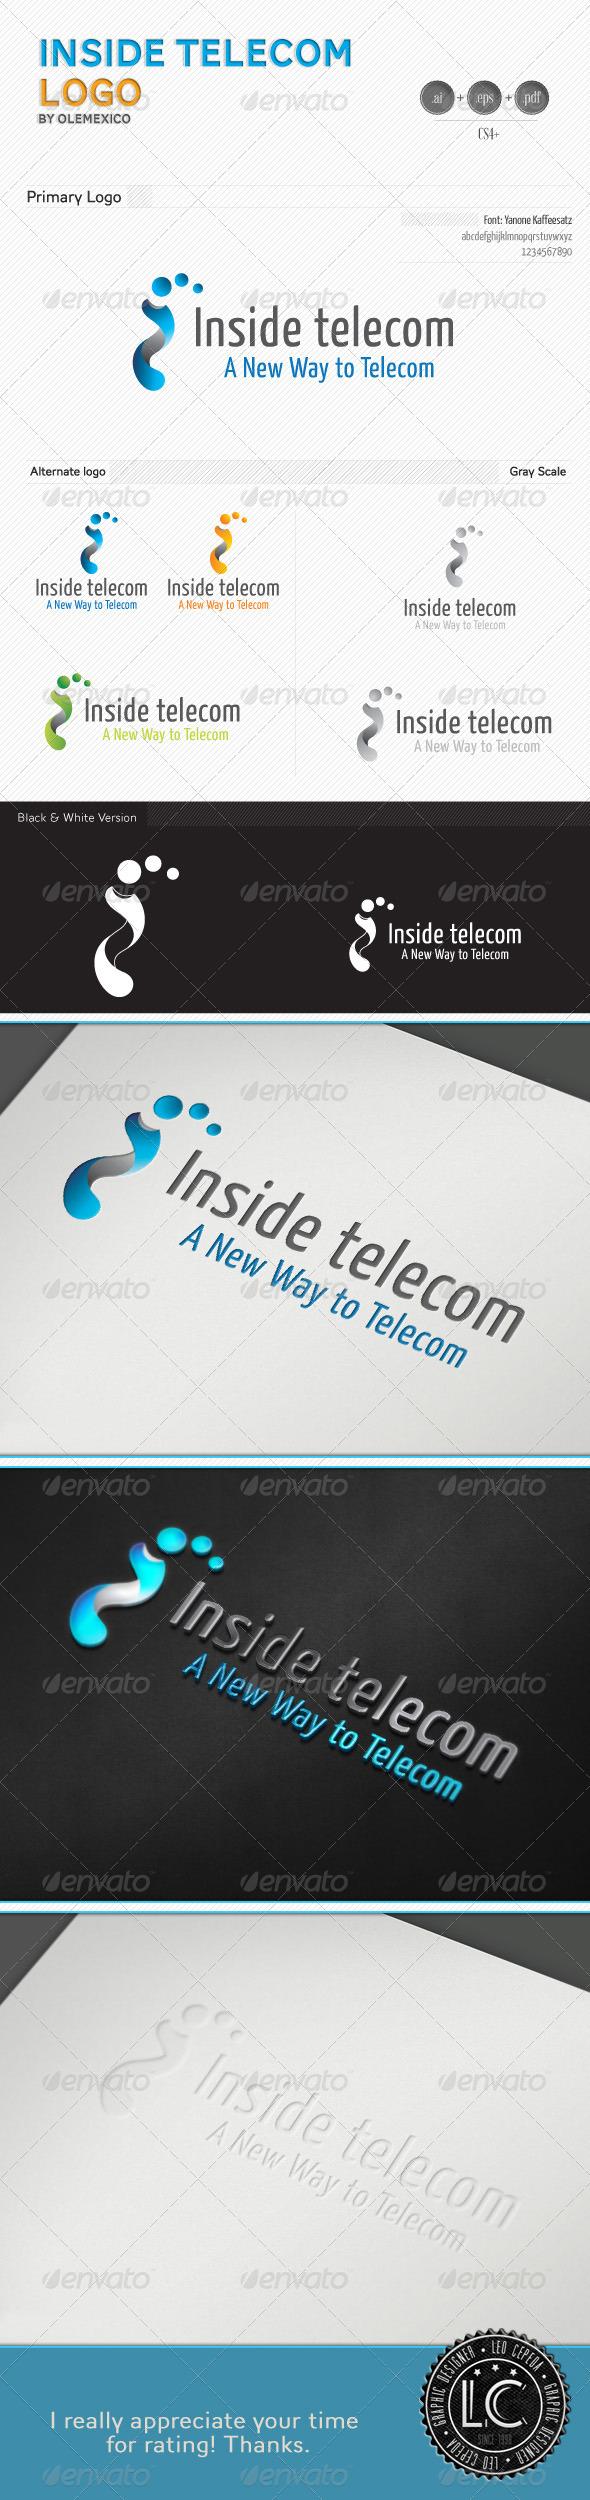 Inside Telecom Logo - Vector Abstract